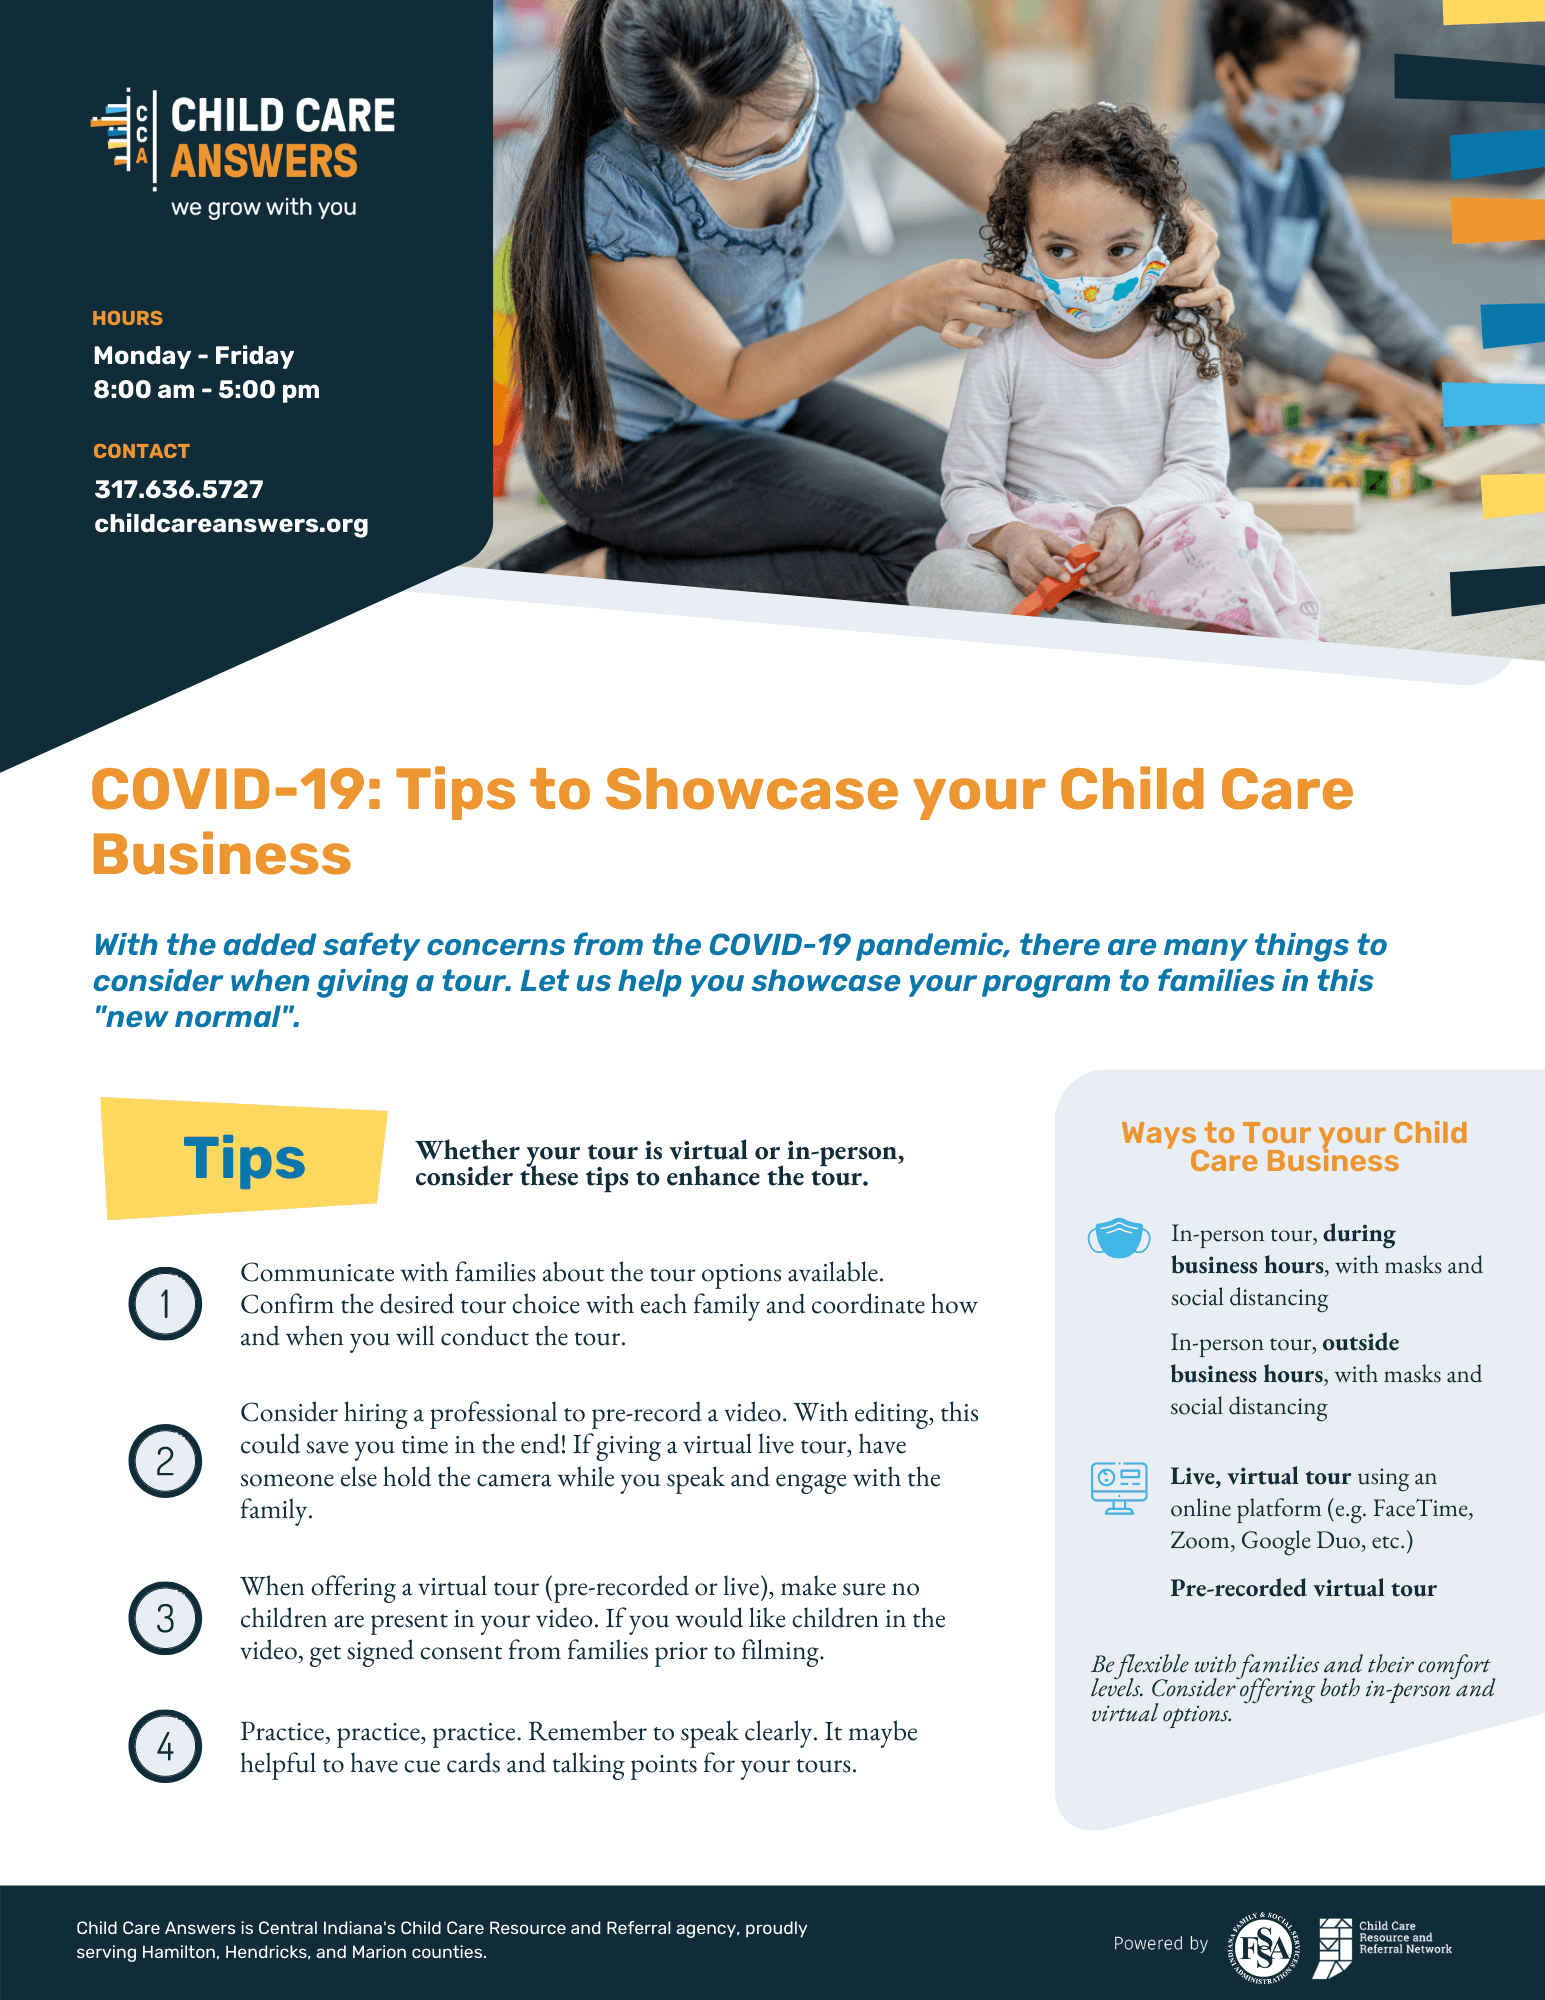 showcase your child care